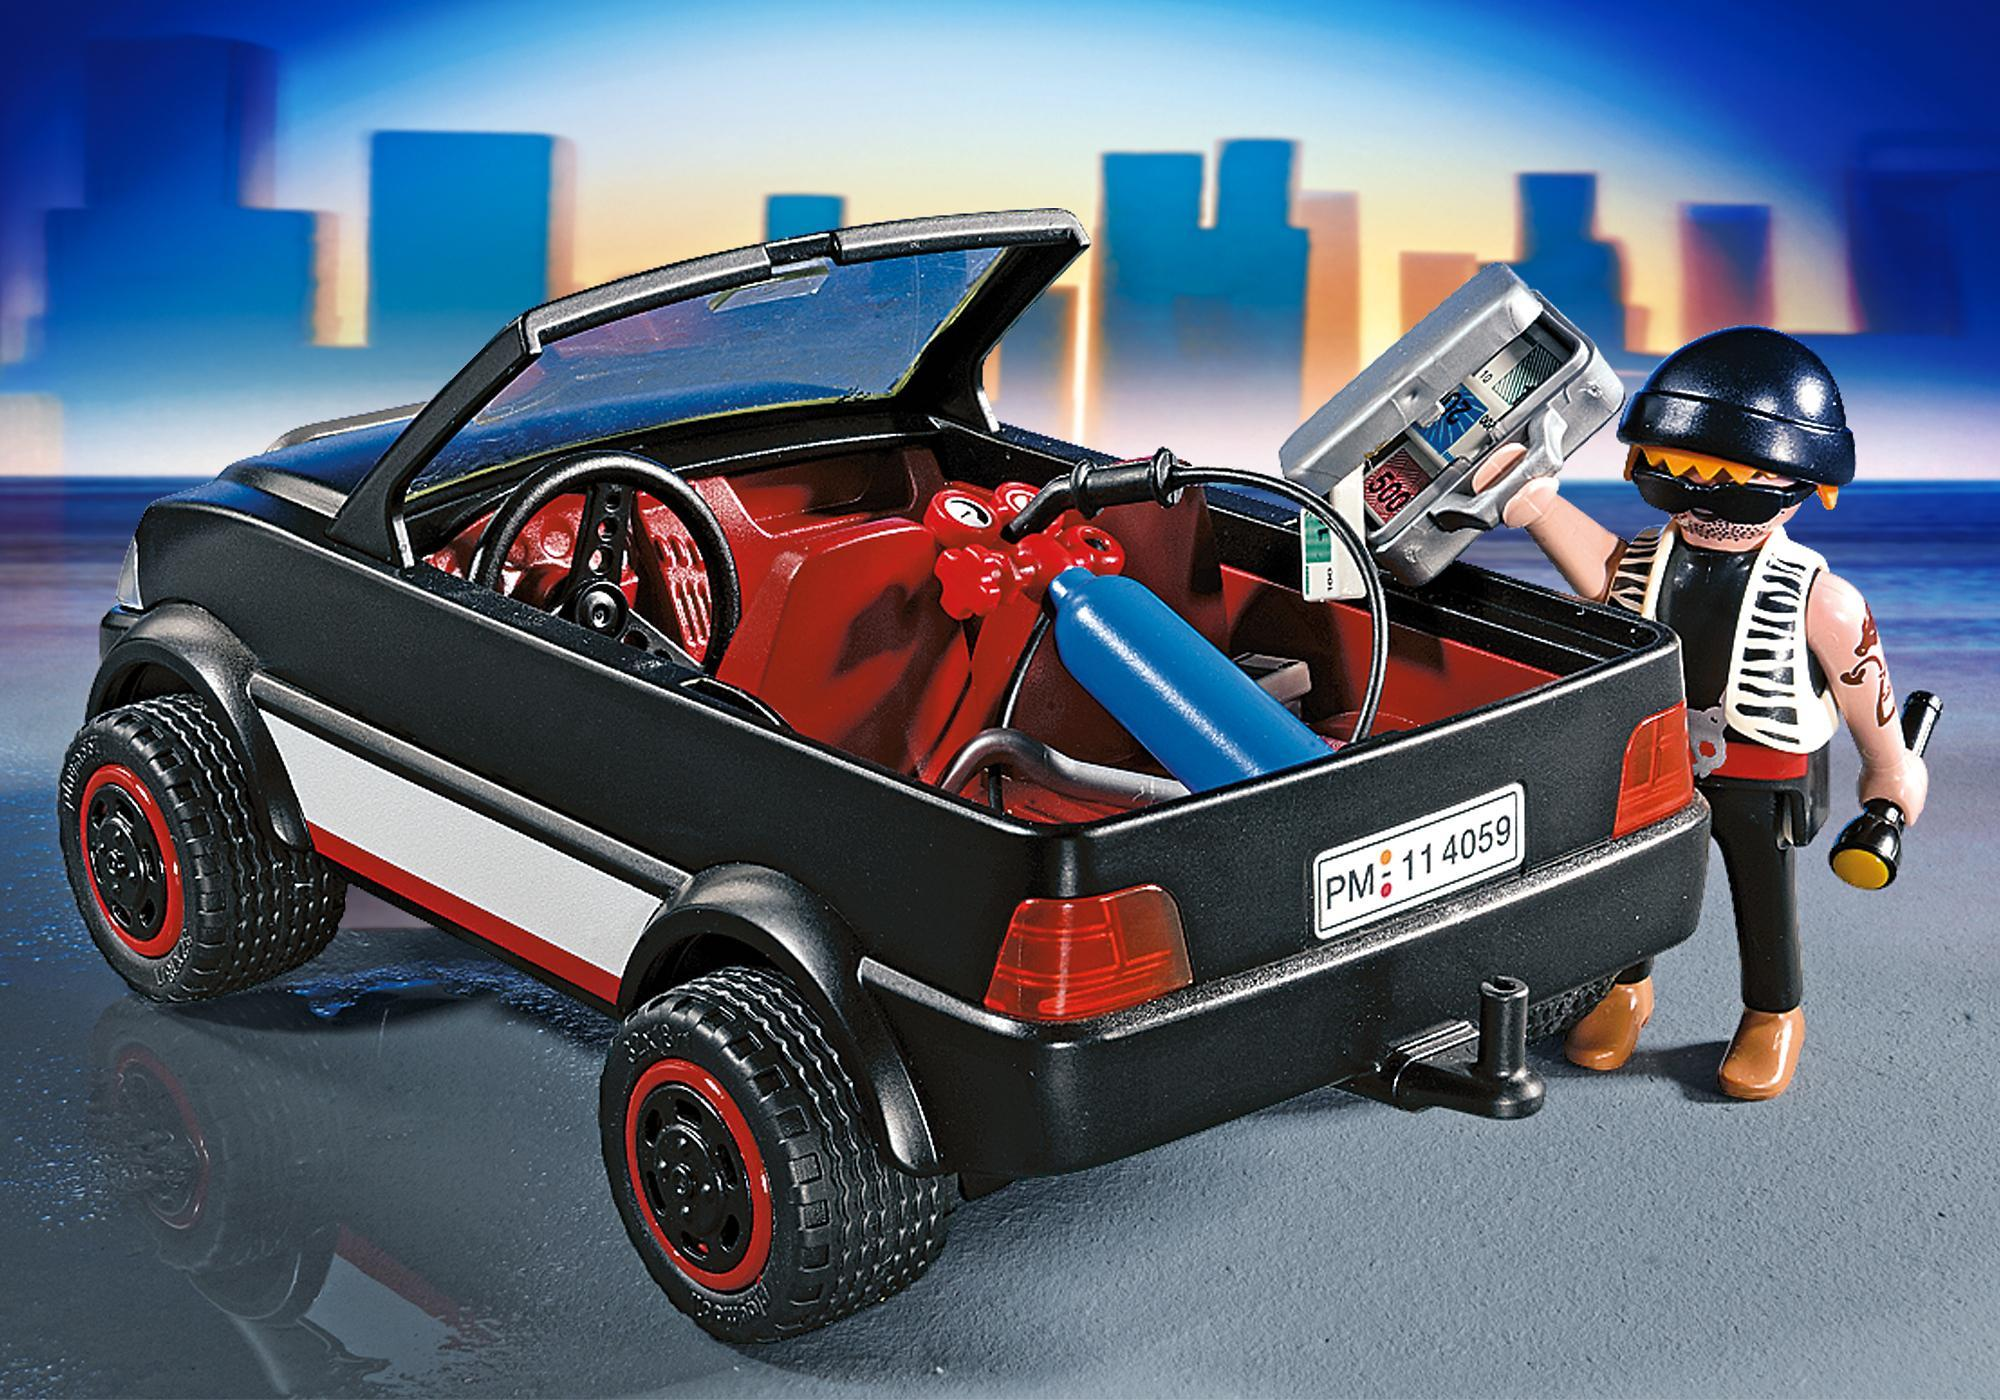 http://media.playmobil.com/i/playmobil/4059_product_extra1/Thief with Safe and Getaway Car